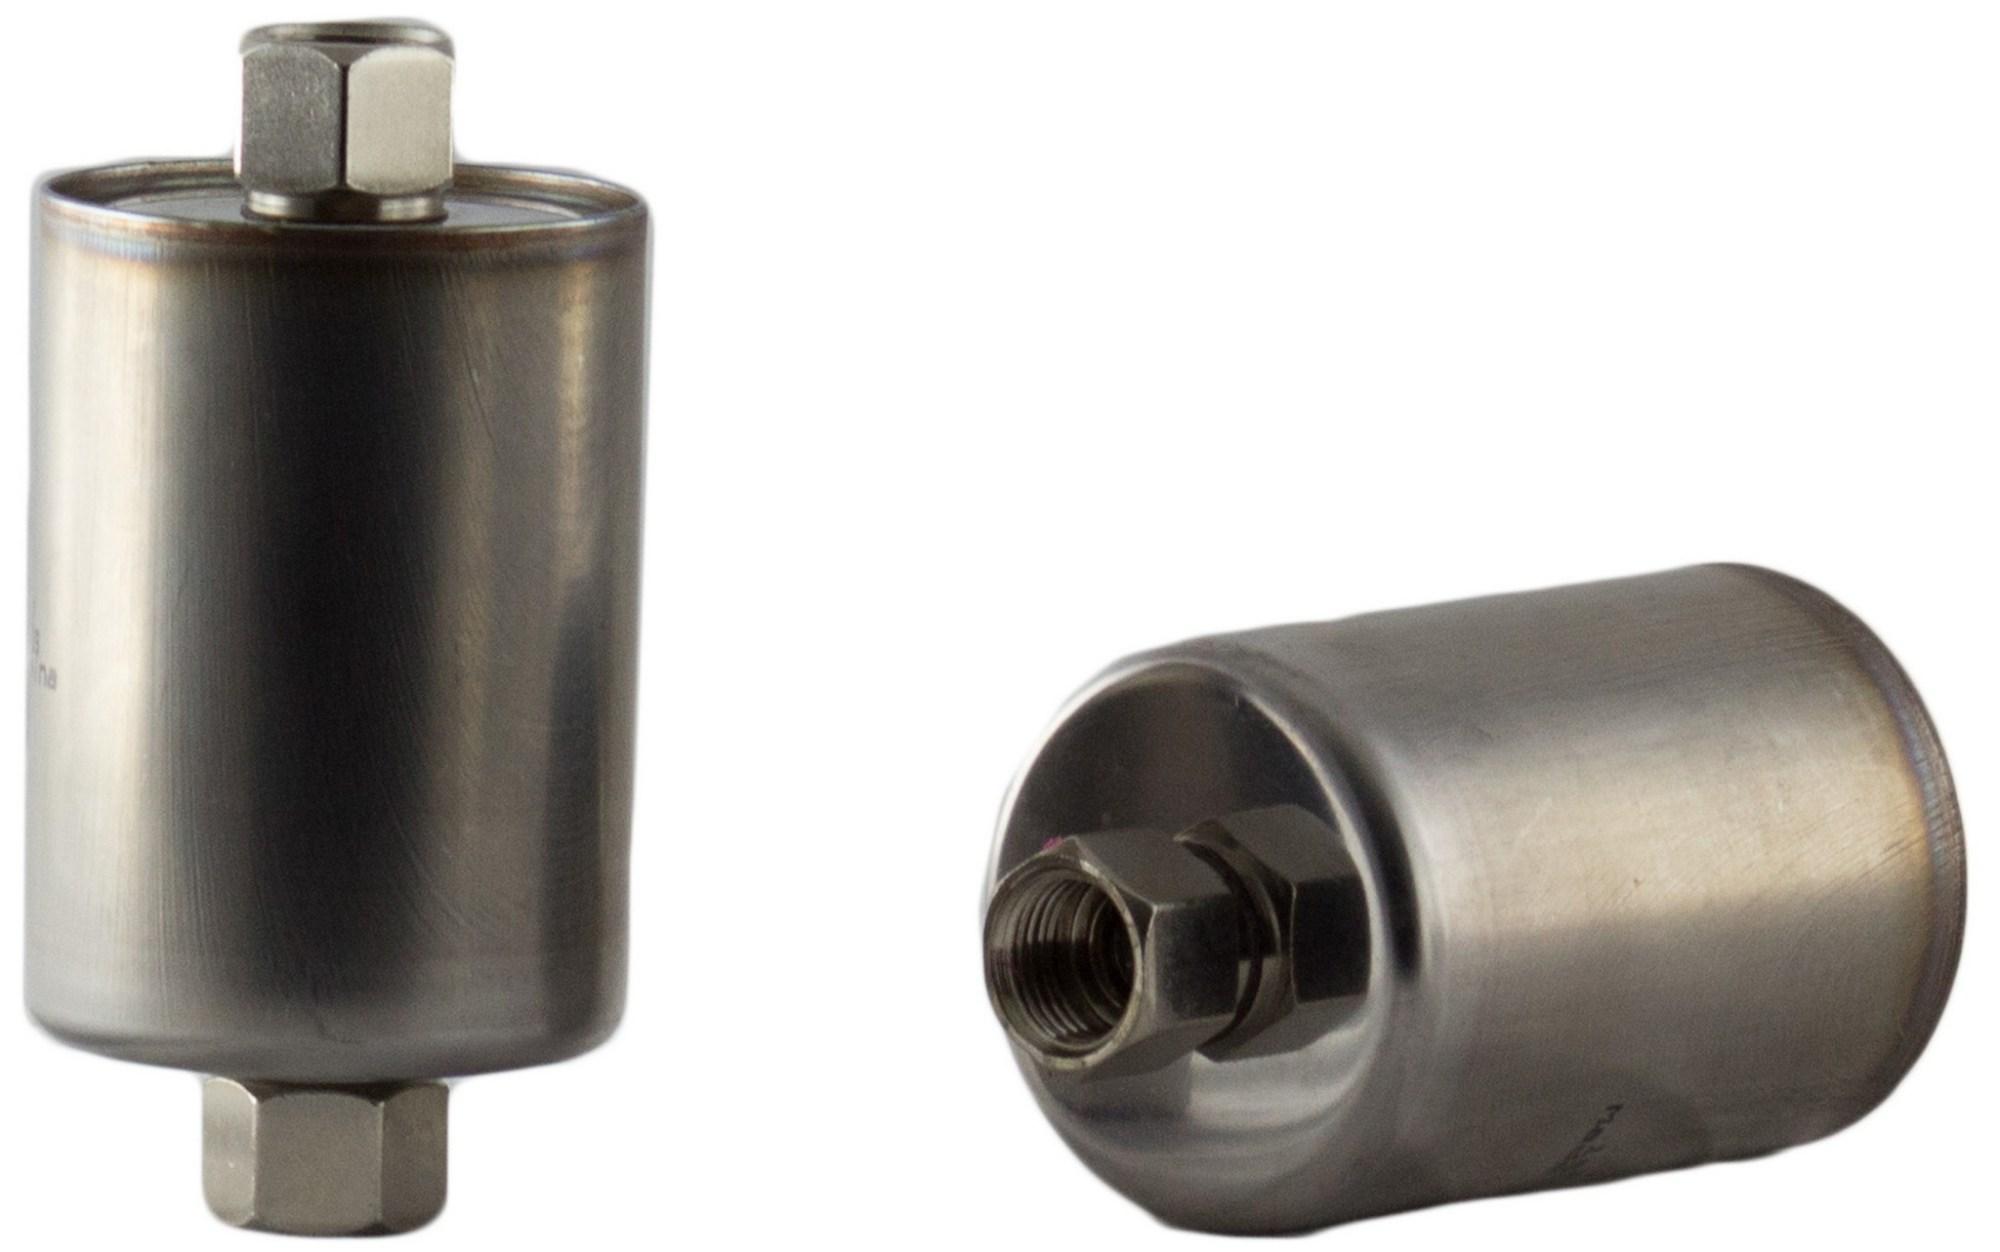 hight resolution of 1990 buick regal fuel filter autopartskart com1990 buick regal fuel filter pg pf3144